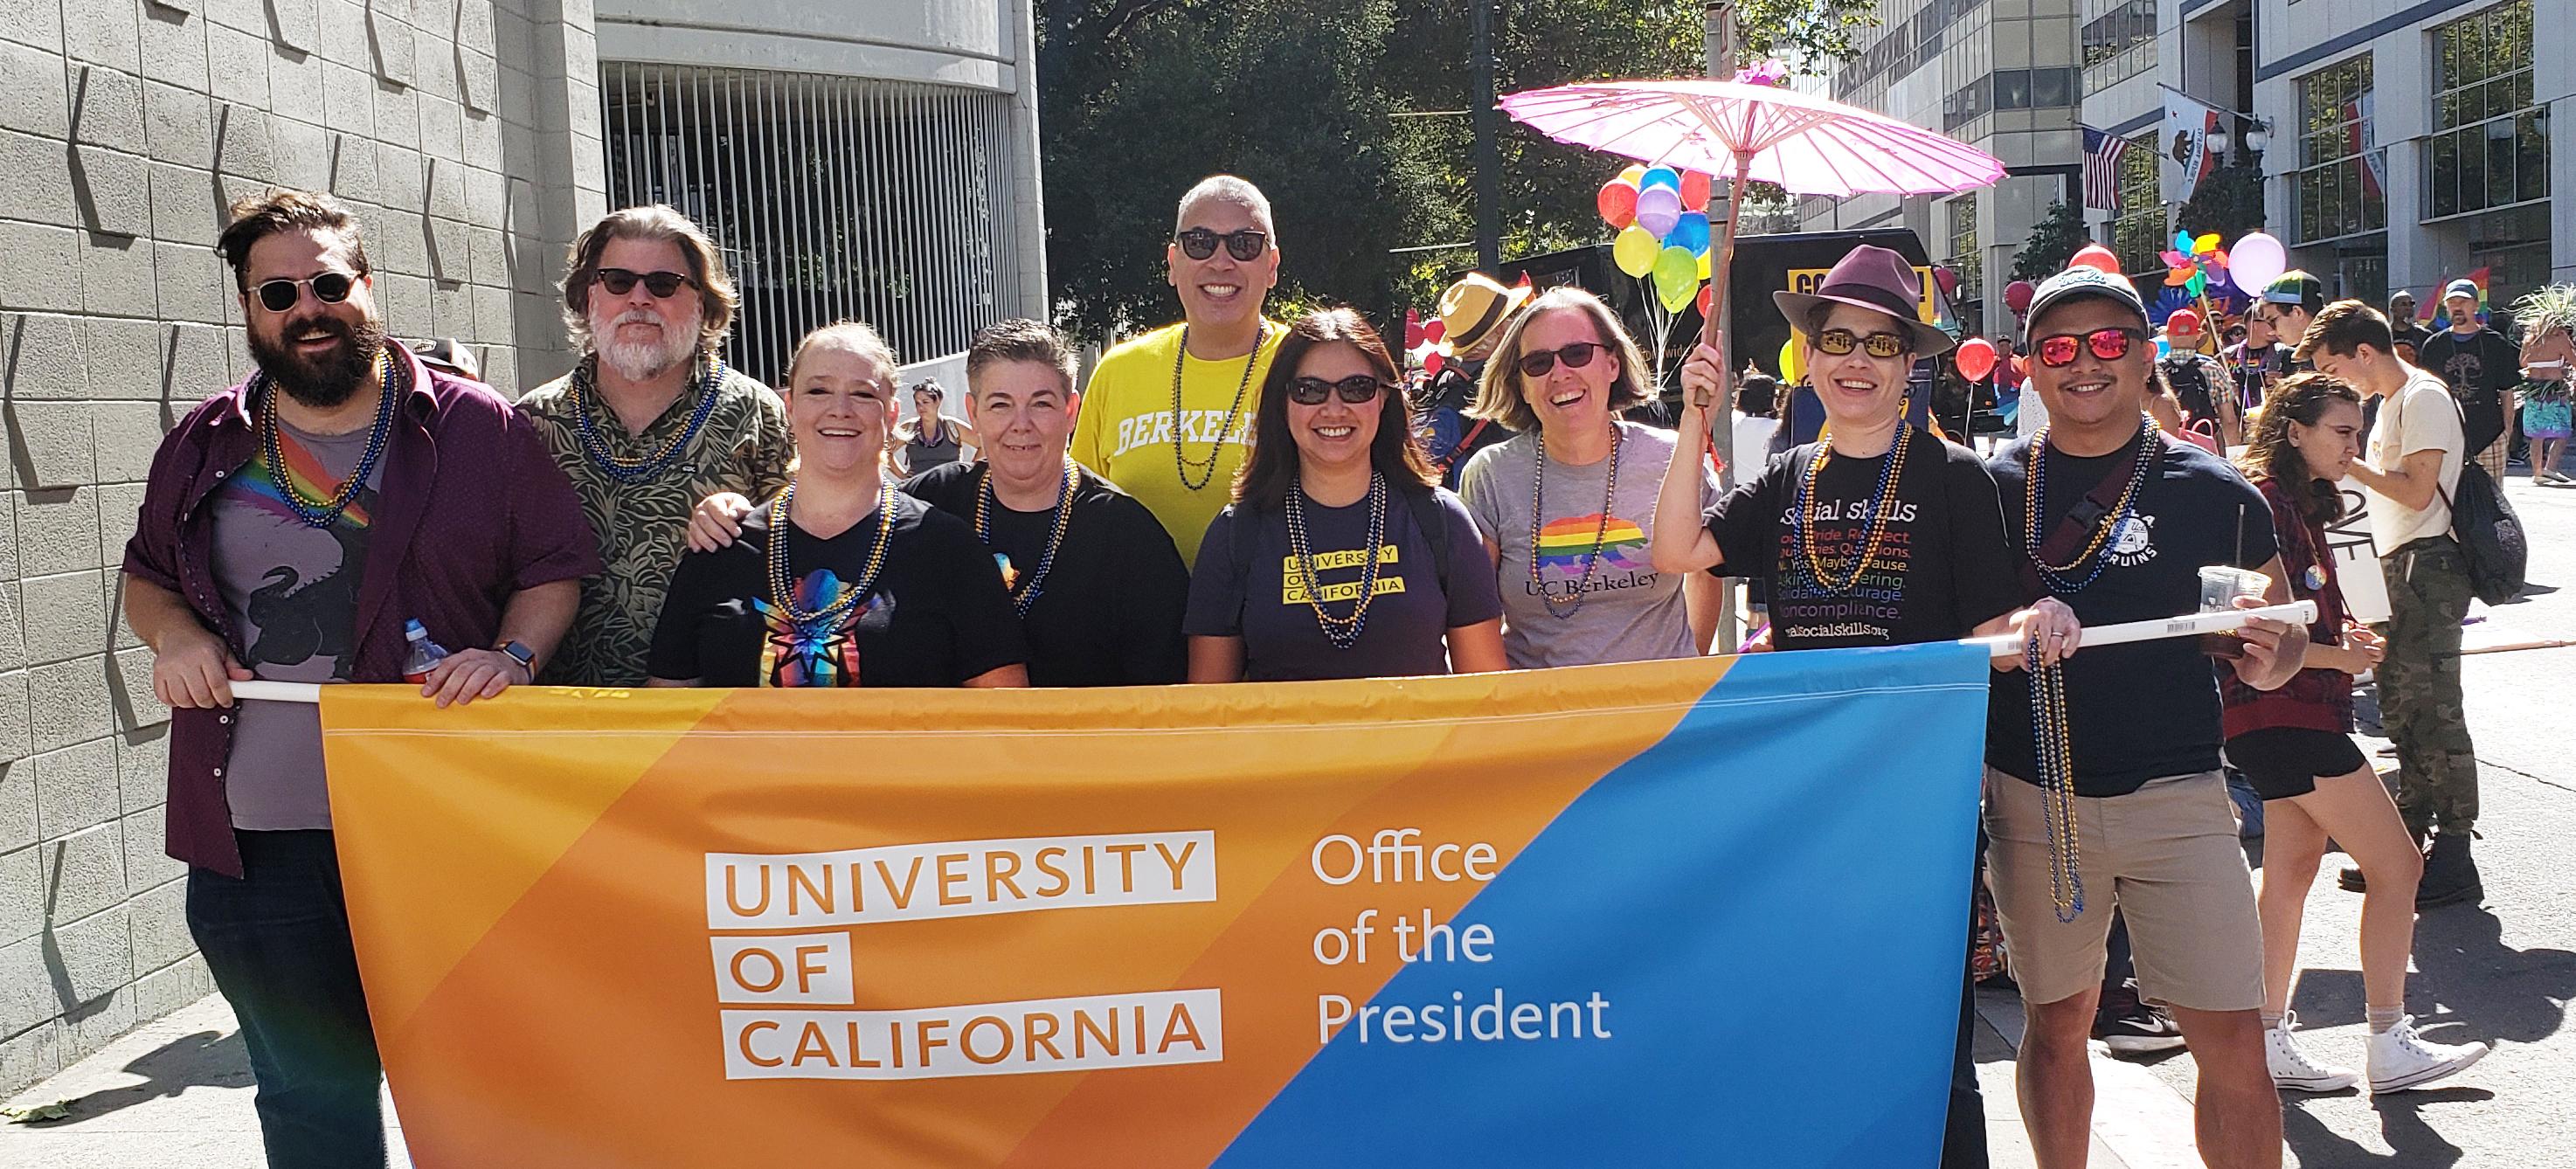 UCOP Pride celebrates community in Oakland